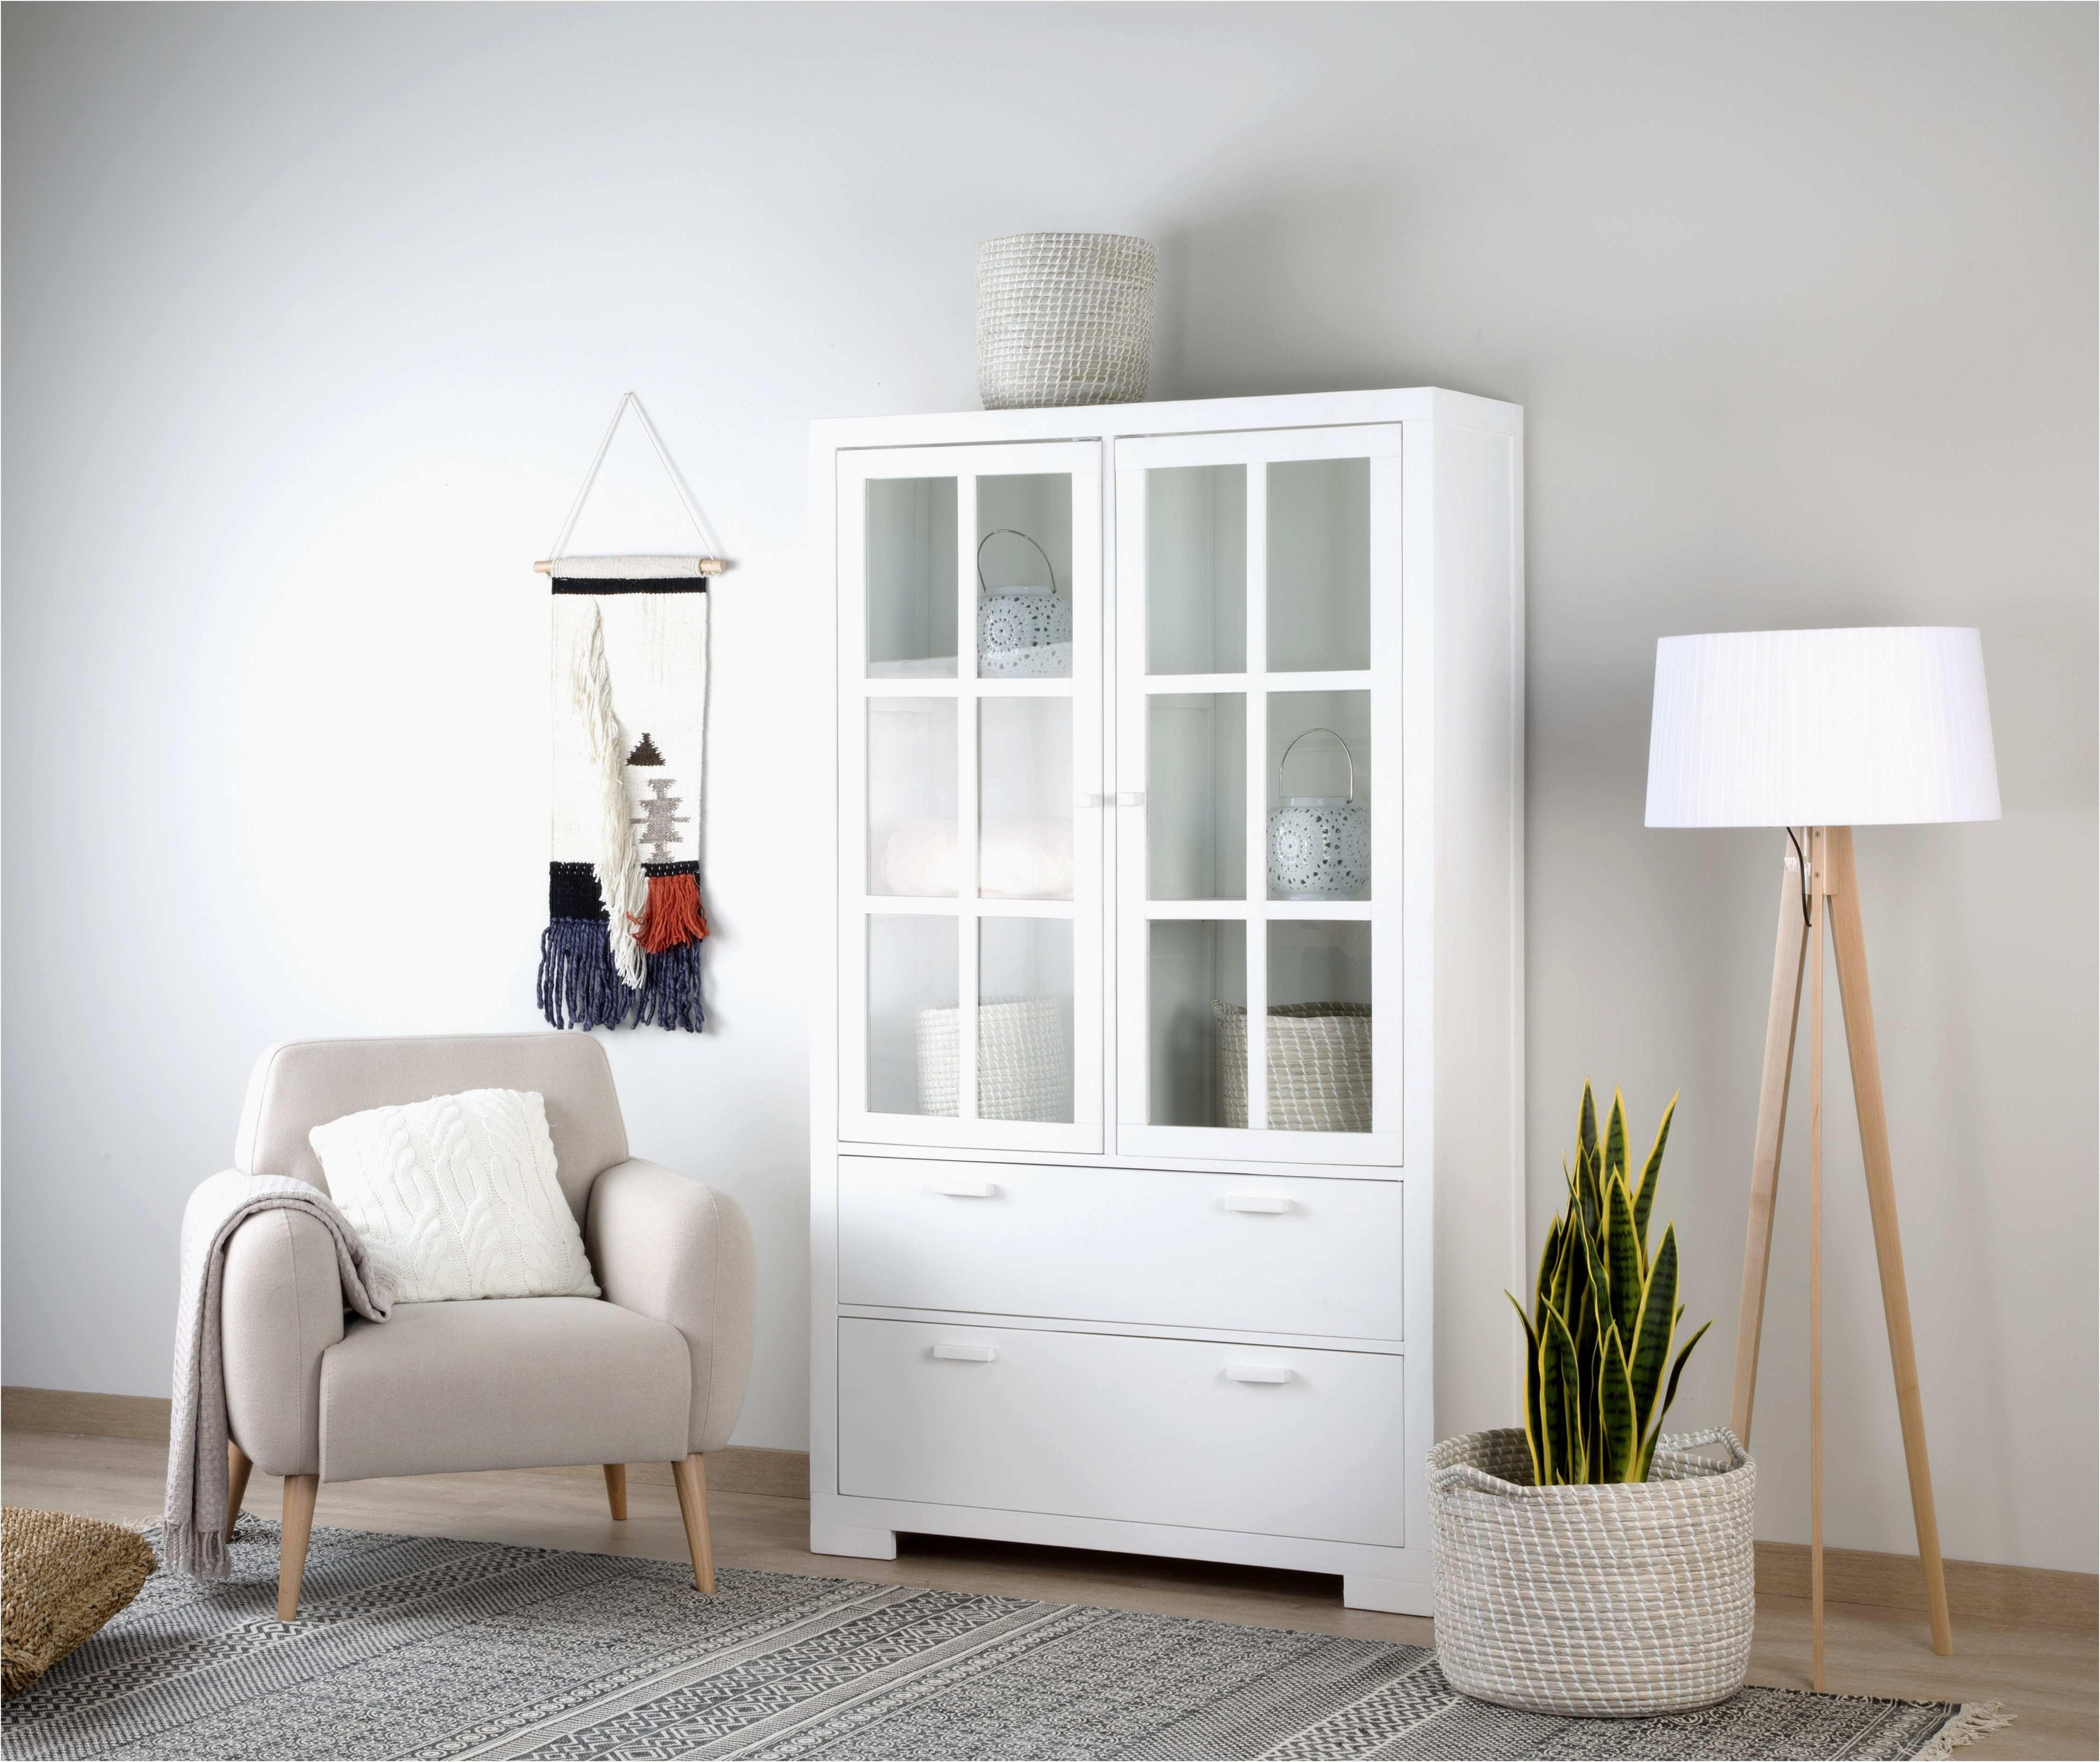 Muebles De Segunda Mano Valencia Particulares E6d5 Apartamentos Baratos En Gandia 25 Famoso Muebles De Icina En